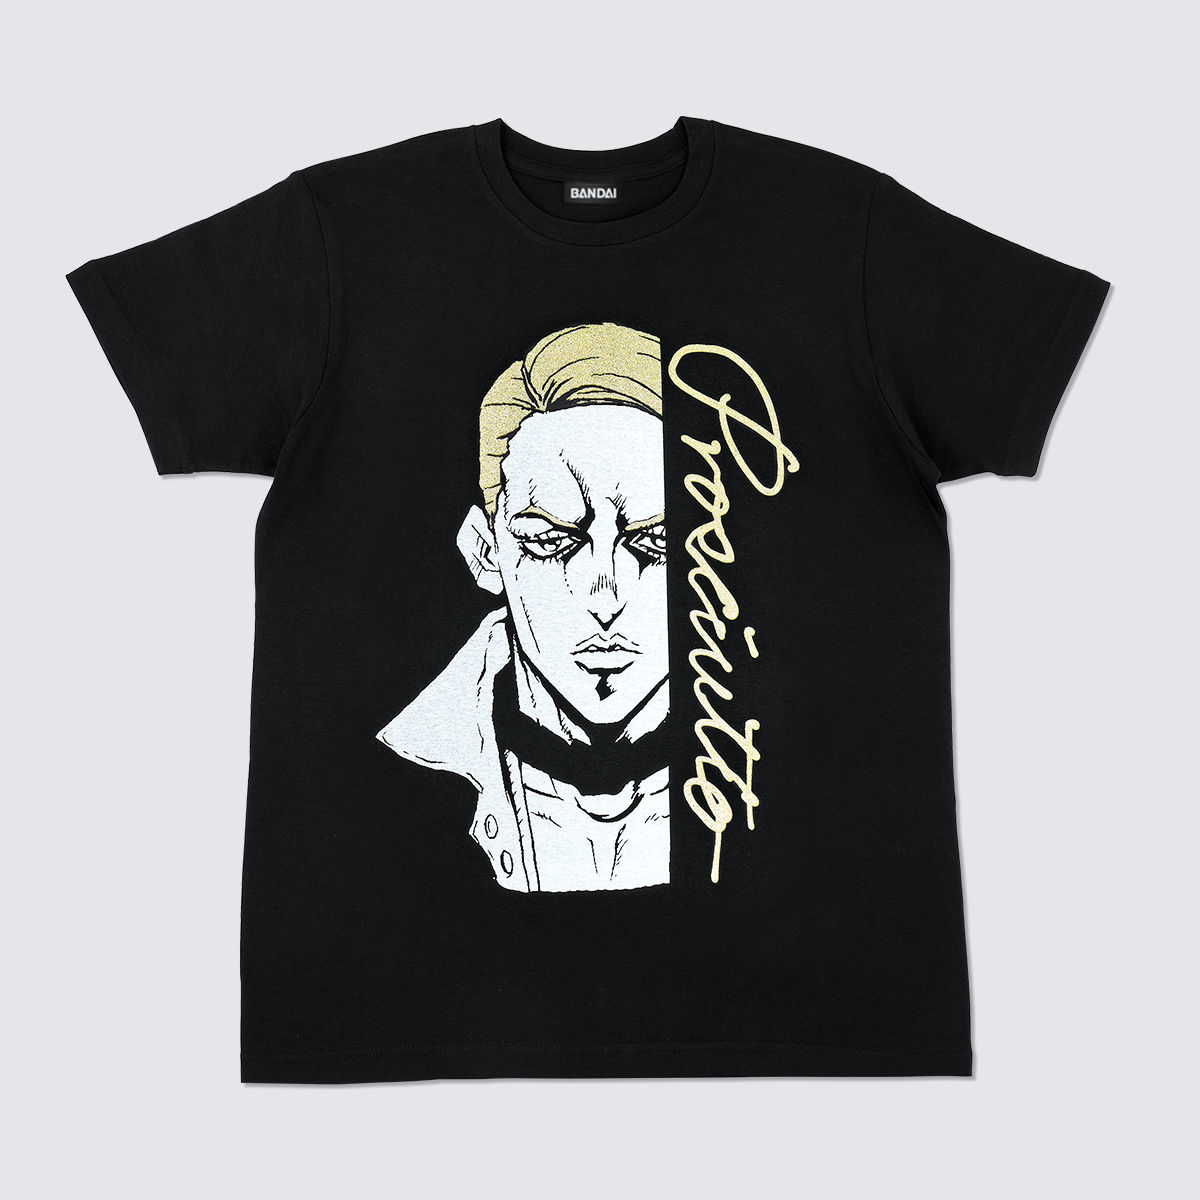 Hitman Team T-shirt (Prosciutto)—JoJo's Bizarre Adventure: Golden Wind